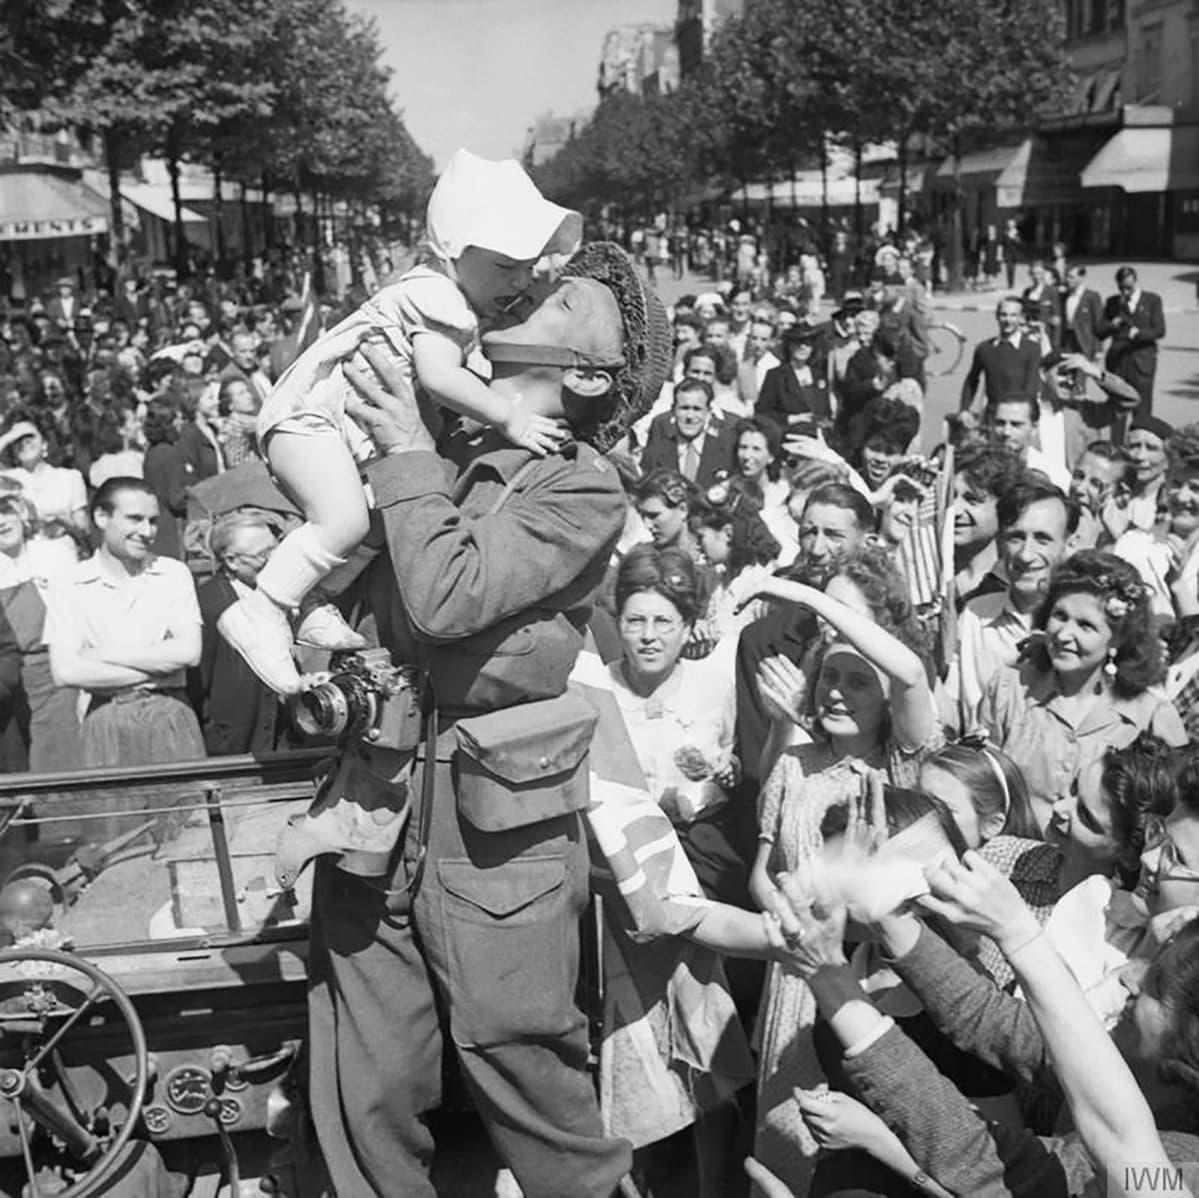 Sotakuvaaja suutelee lasta Pariisissa 26. elokuuta 1944.